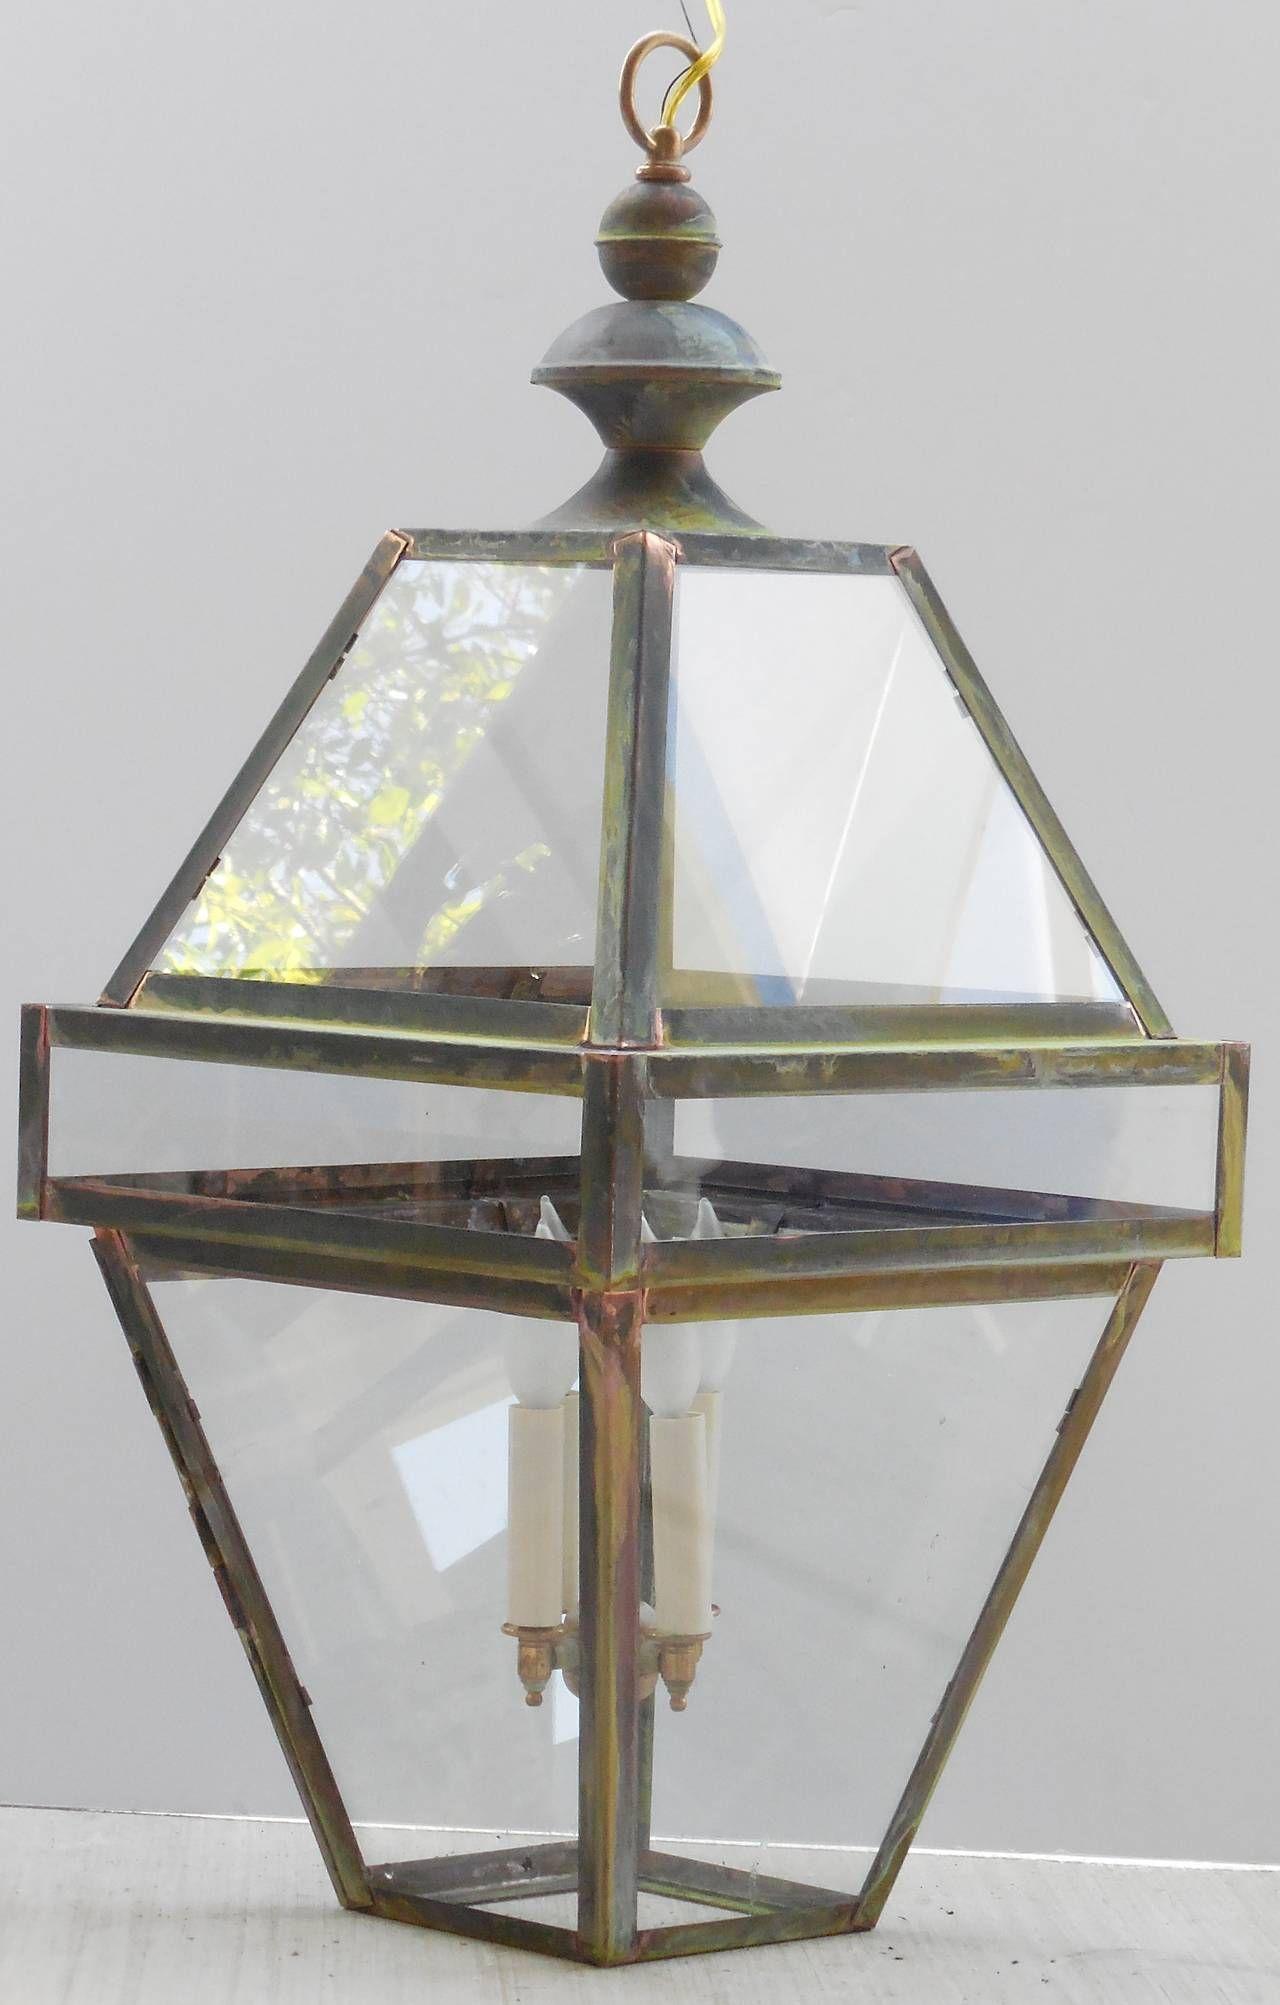 Four Sides Hanging Copper Lantern | Copper lantern